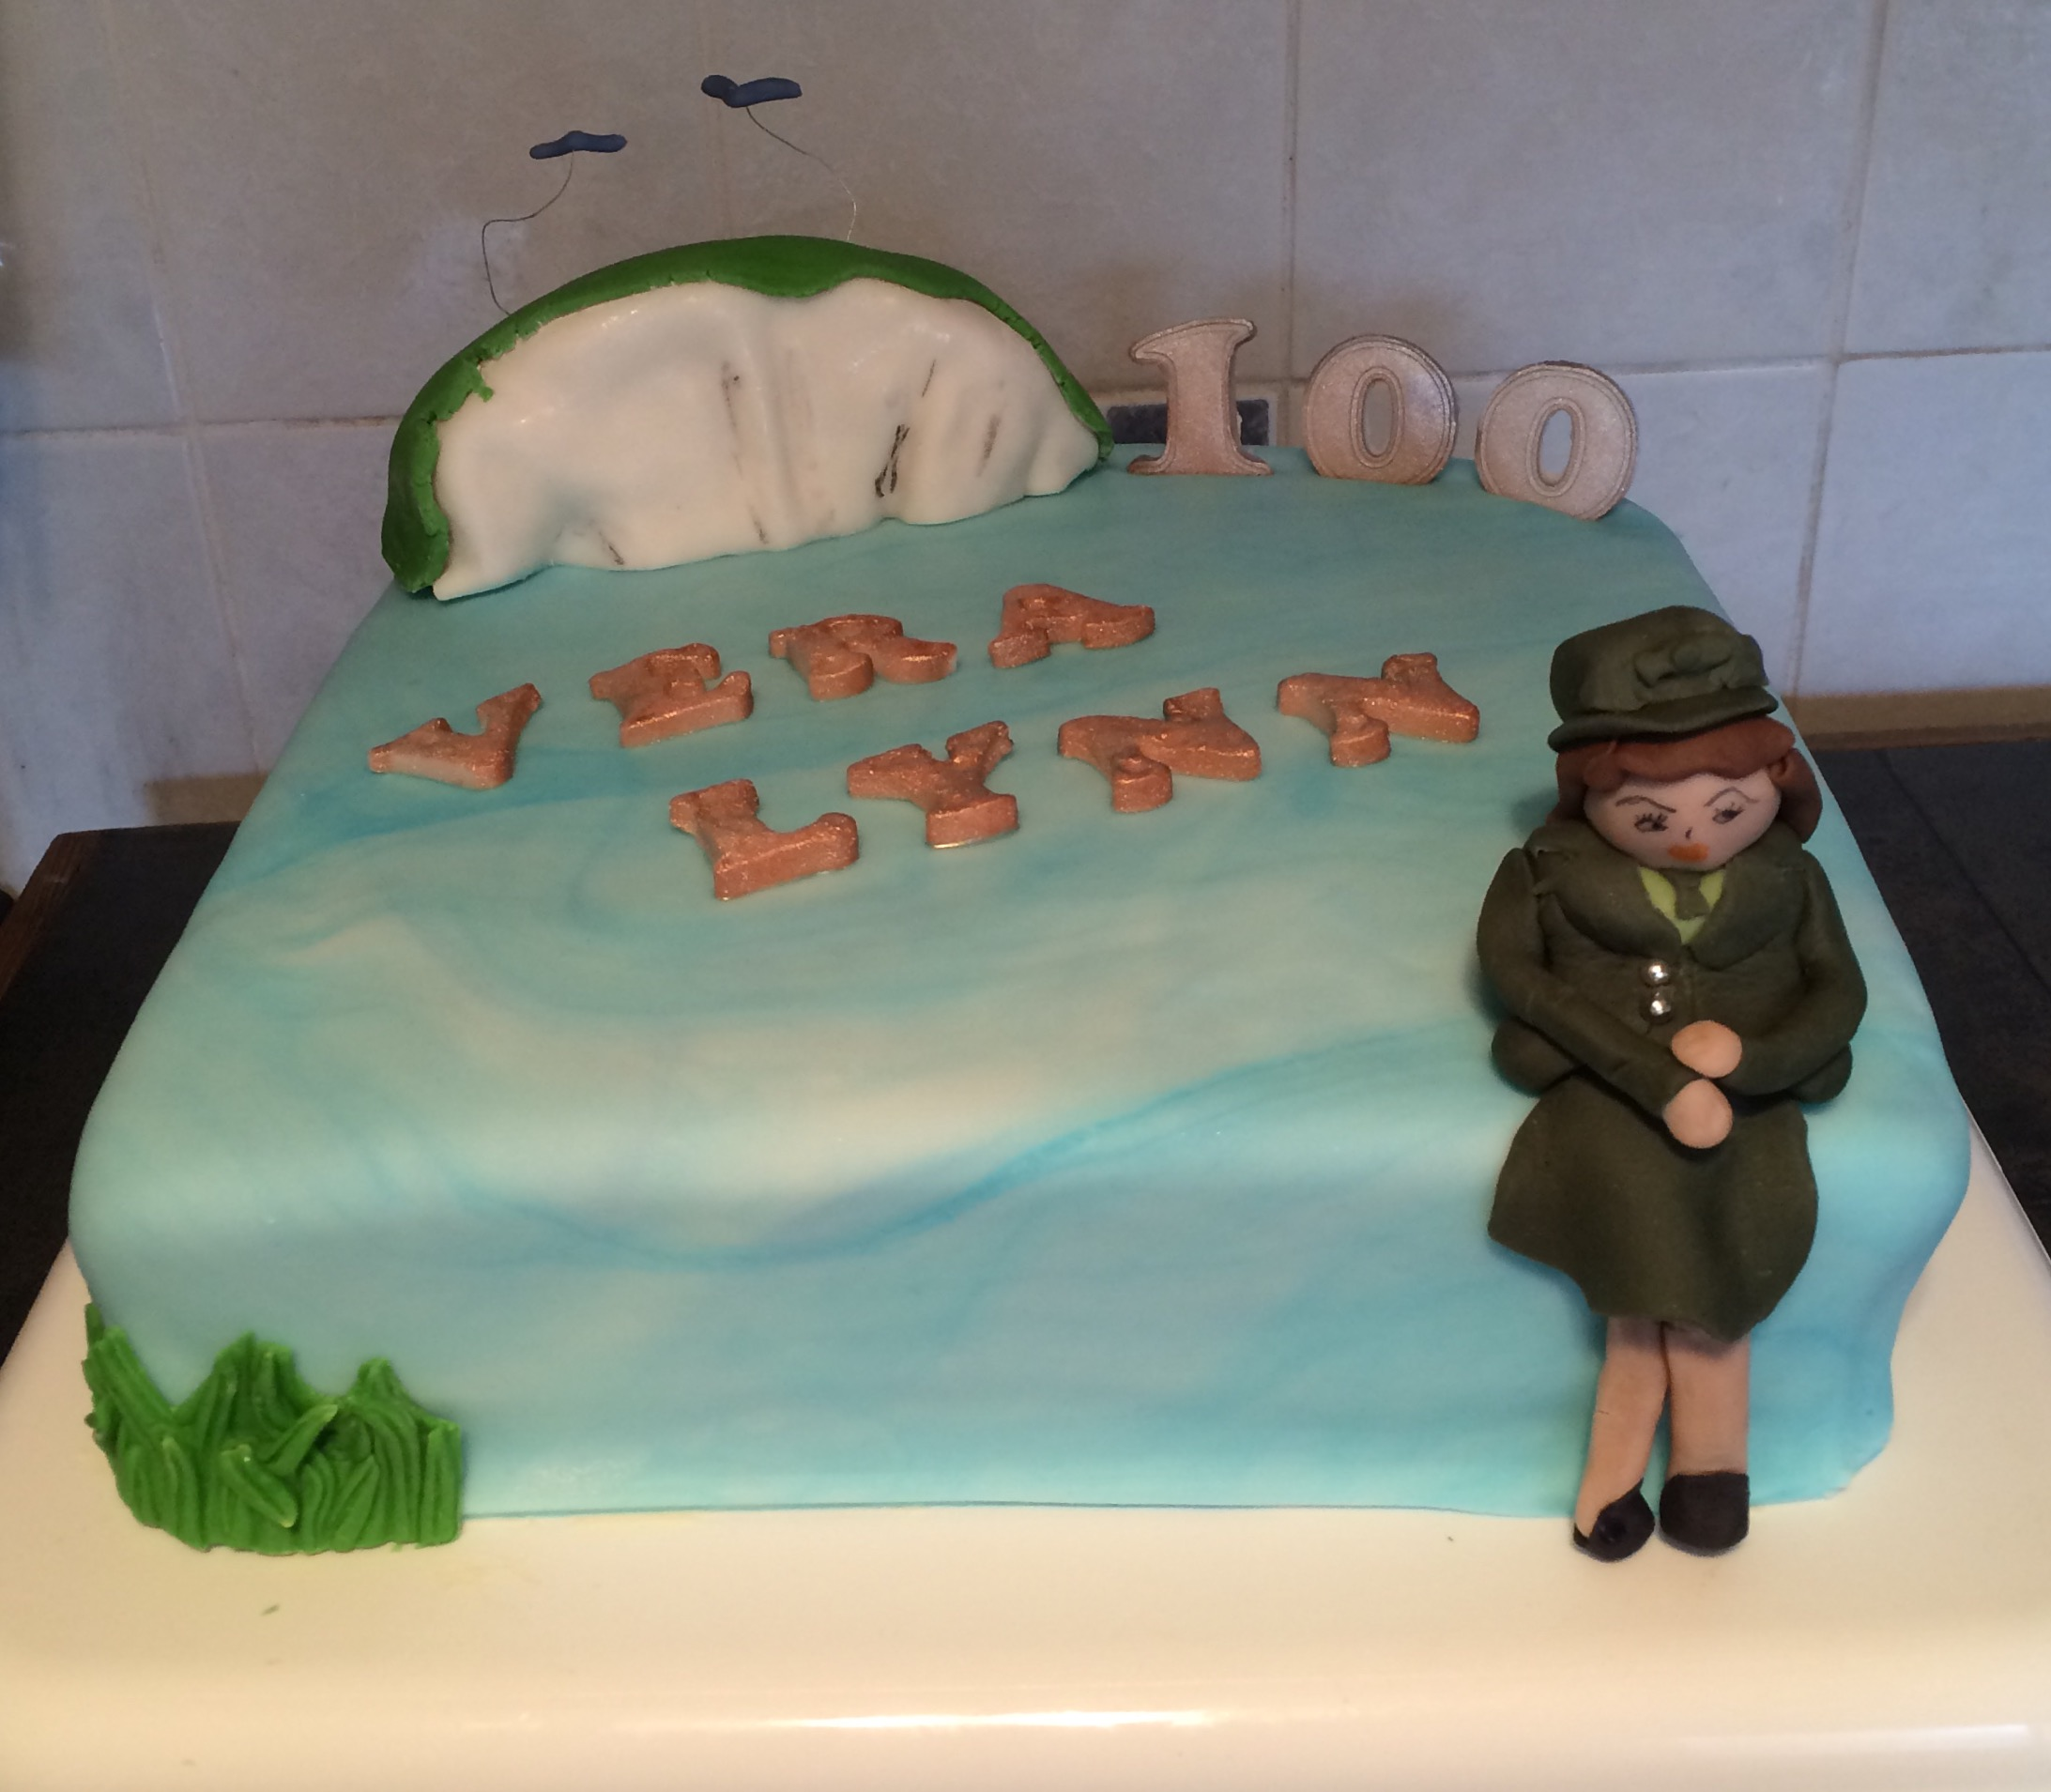 100th Birthday Cake - Village Green Bakes